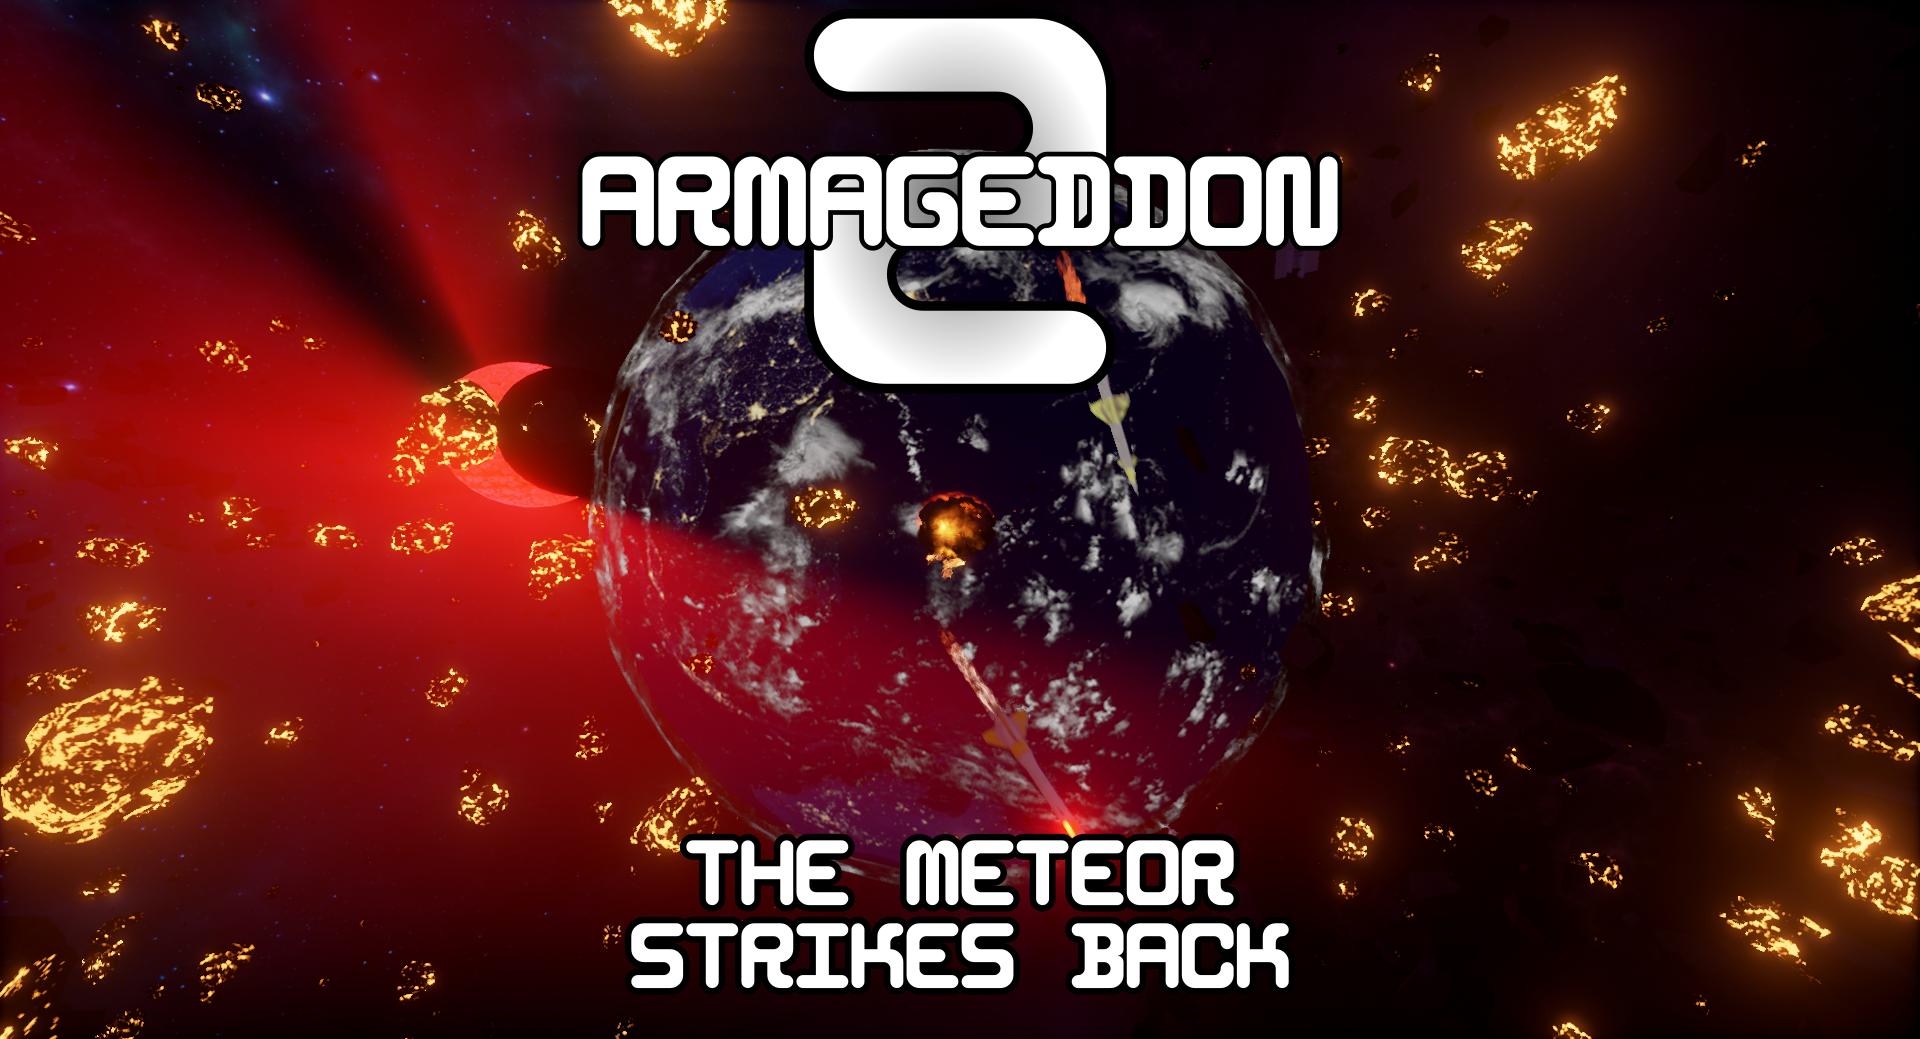 Armageddon 2: The Meteor Strikes Back